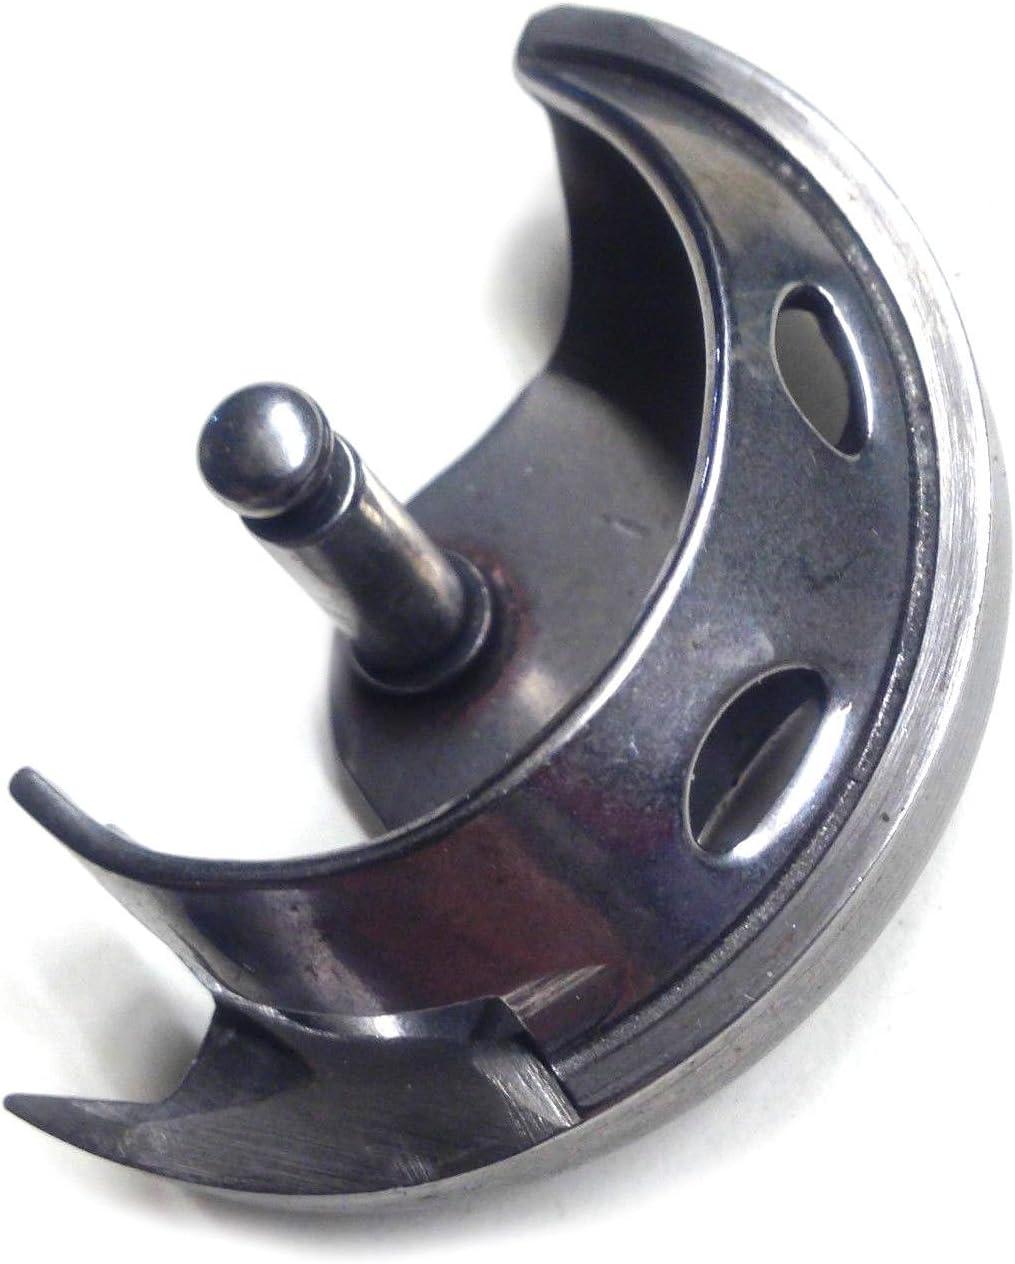 Gancho para máquina de coser doméstica, universal, soporte para bobina